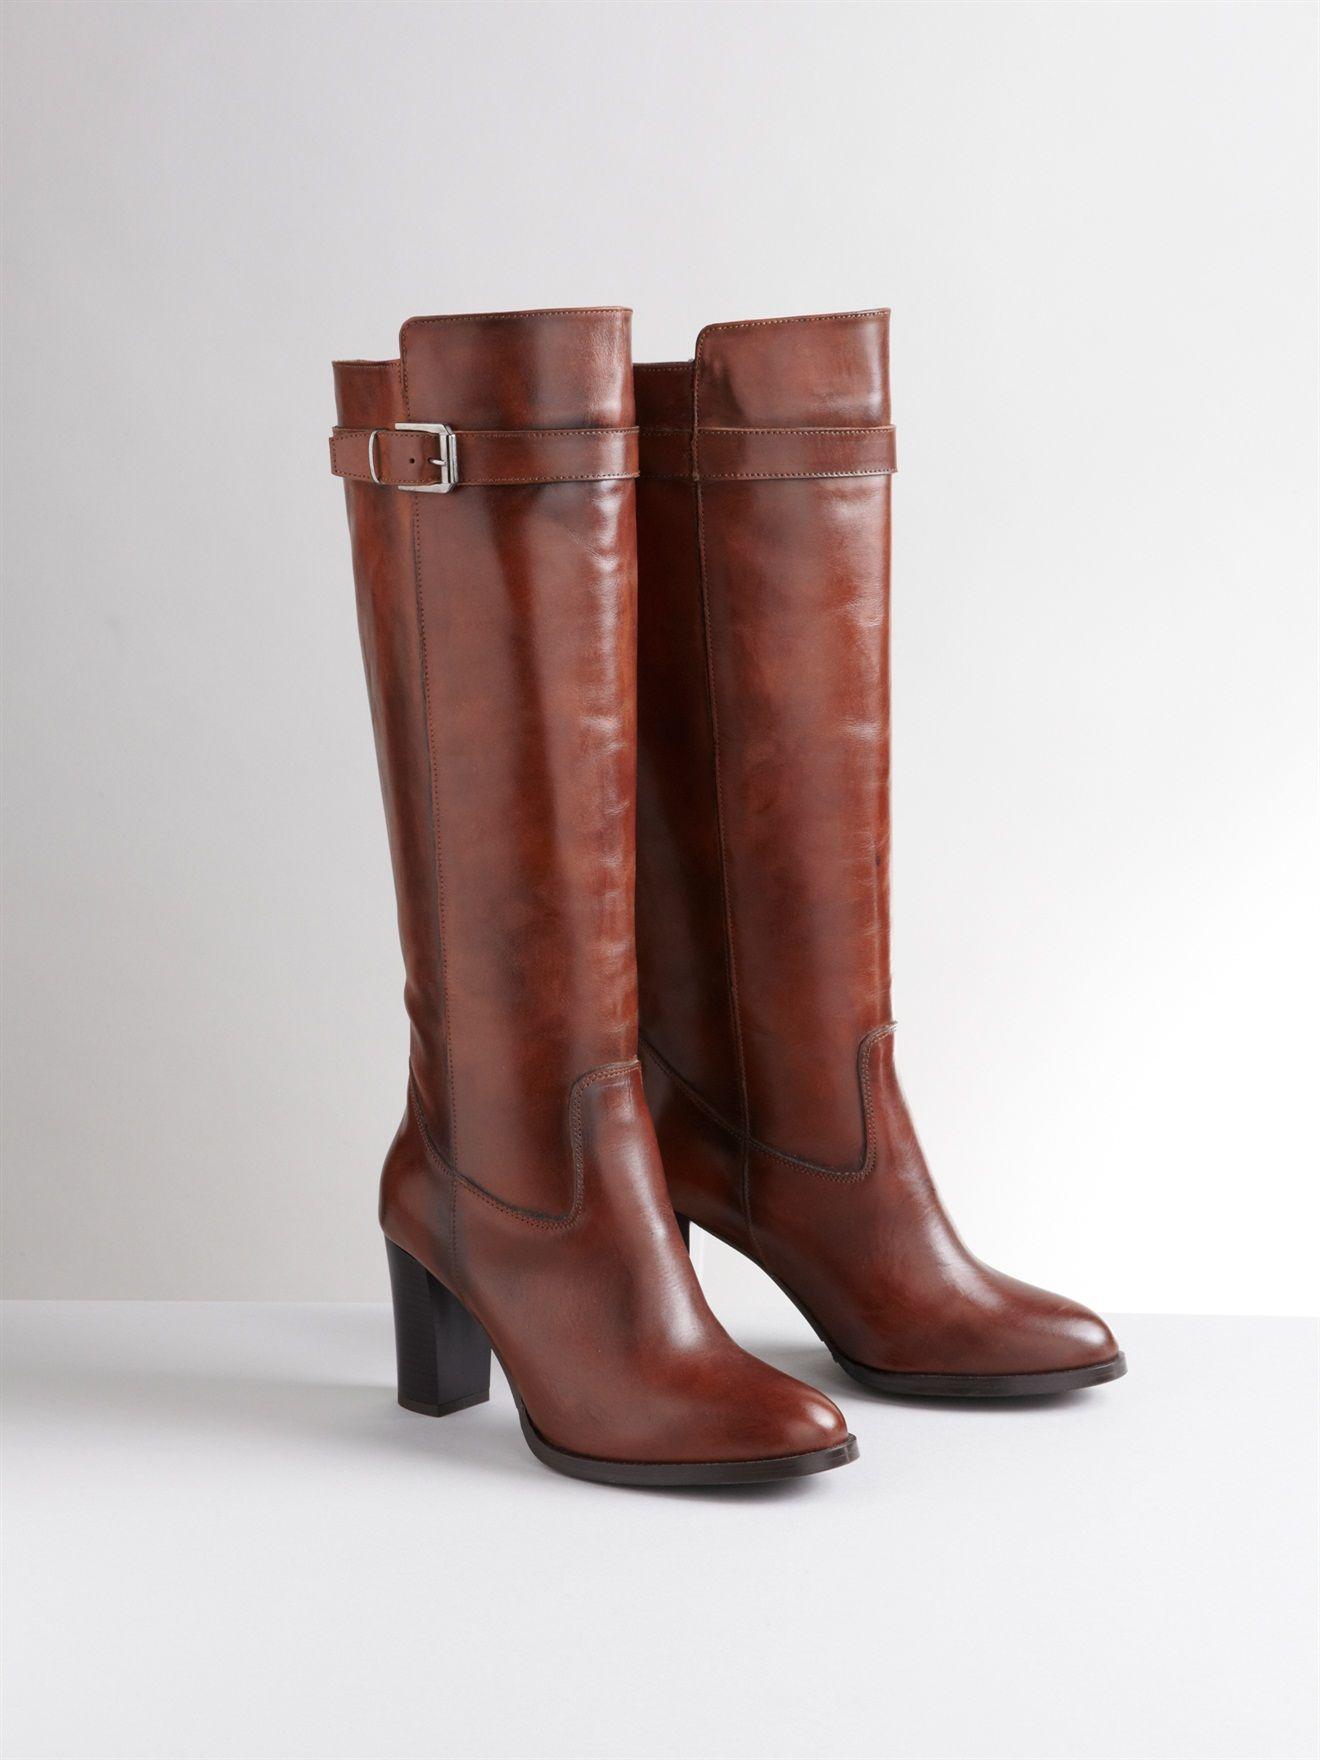 7c22bb9ae SOMEWHERE - Bottes femme à talon en cuir marron (AH13) | My Style ...